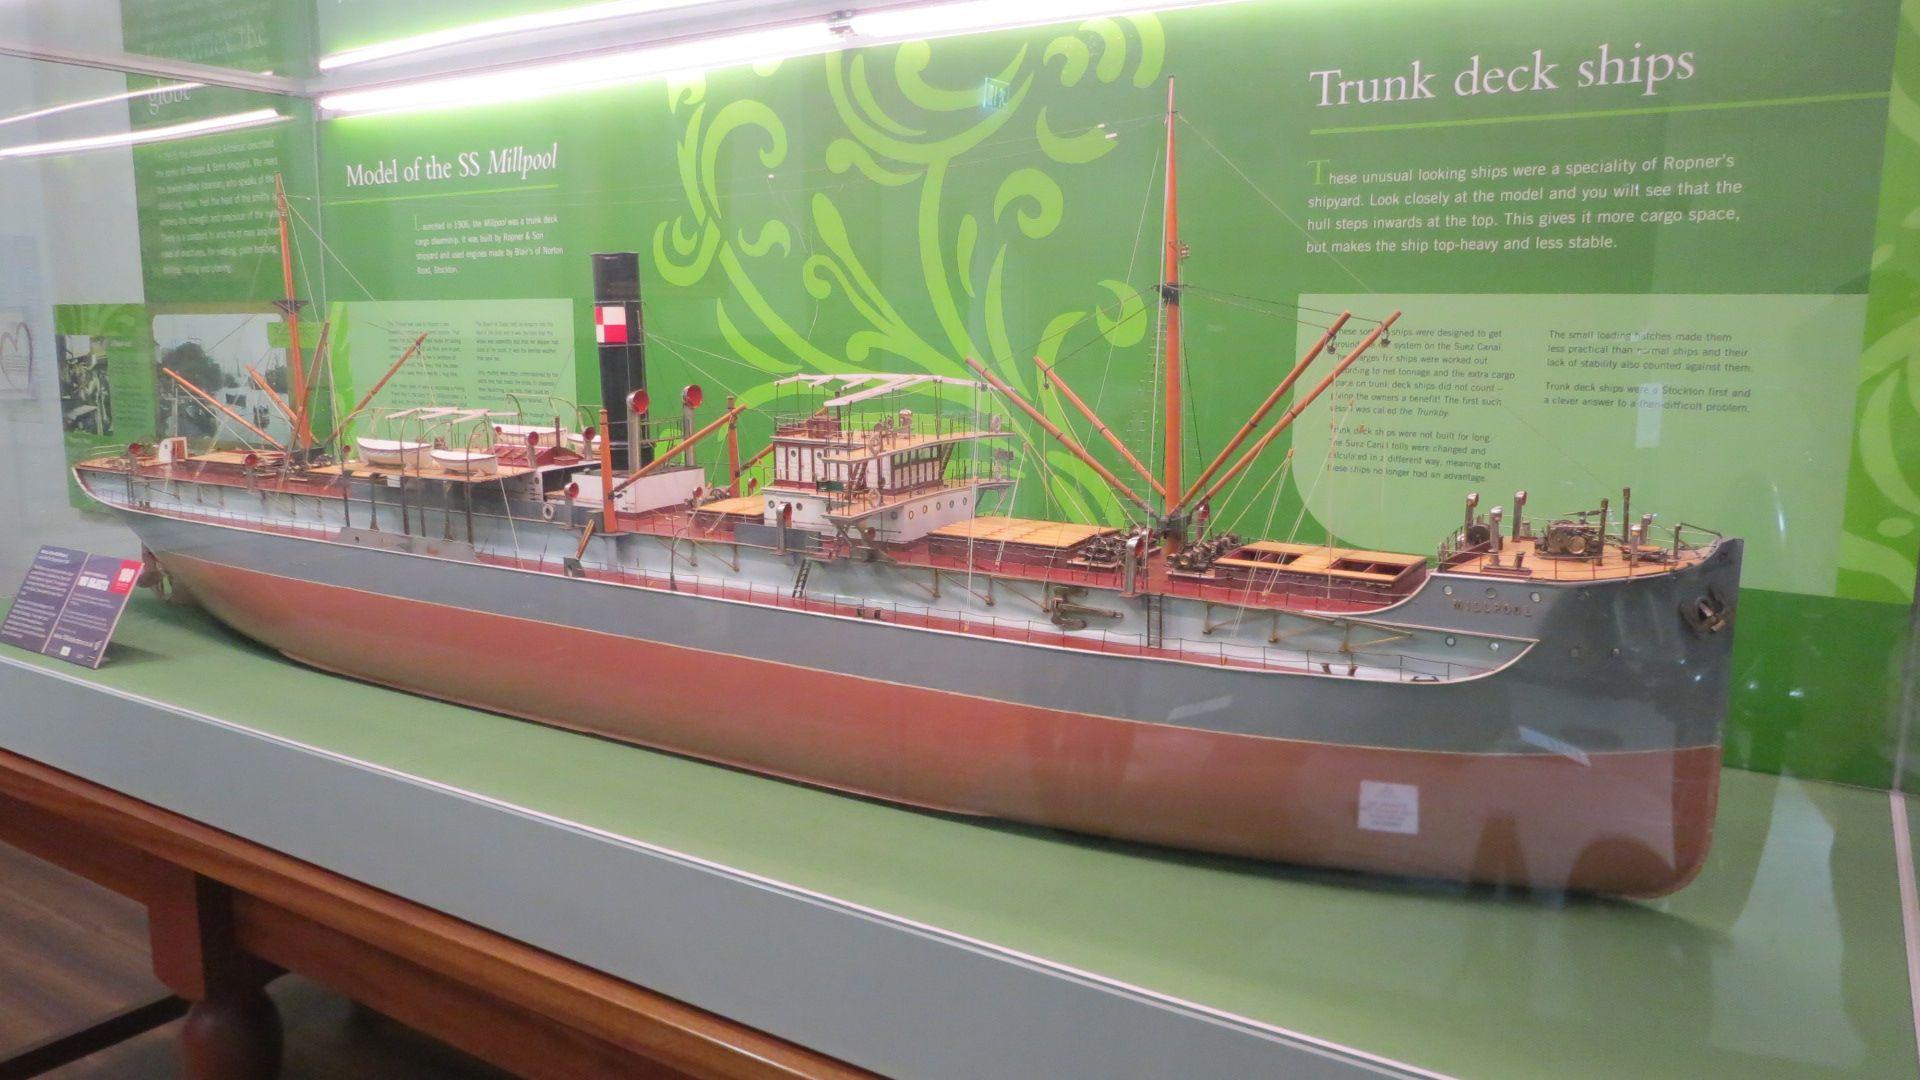 Millpool ship model